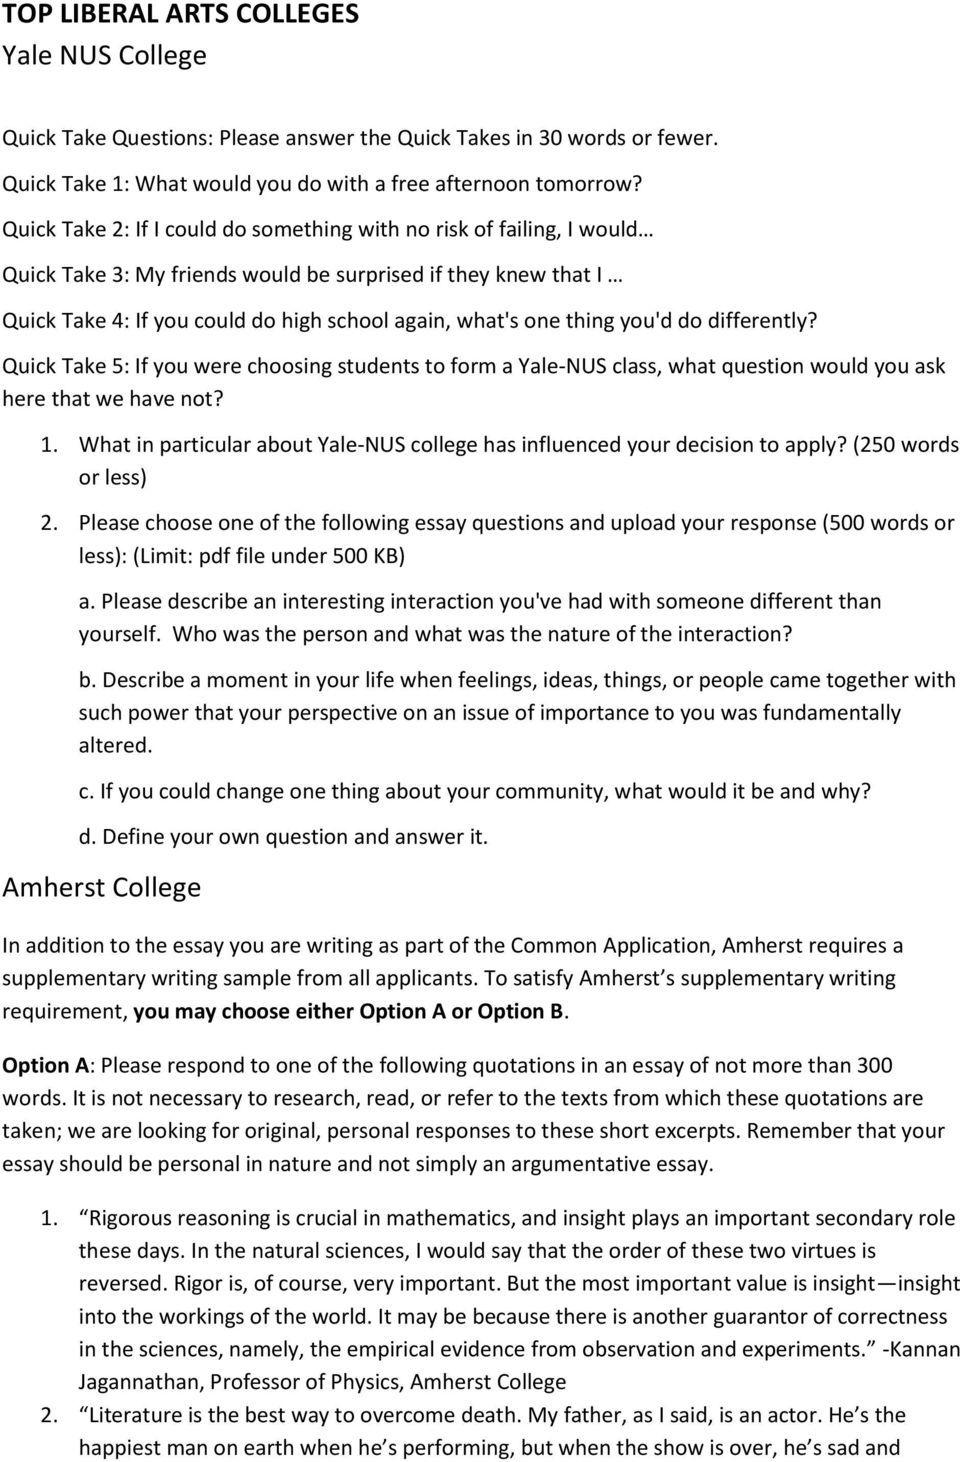 Best College Admission Essay Vocabulary✏️ , Phd dissertation writers